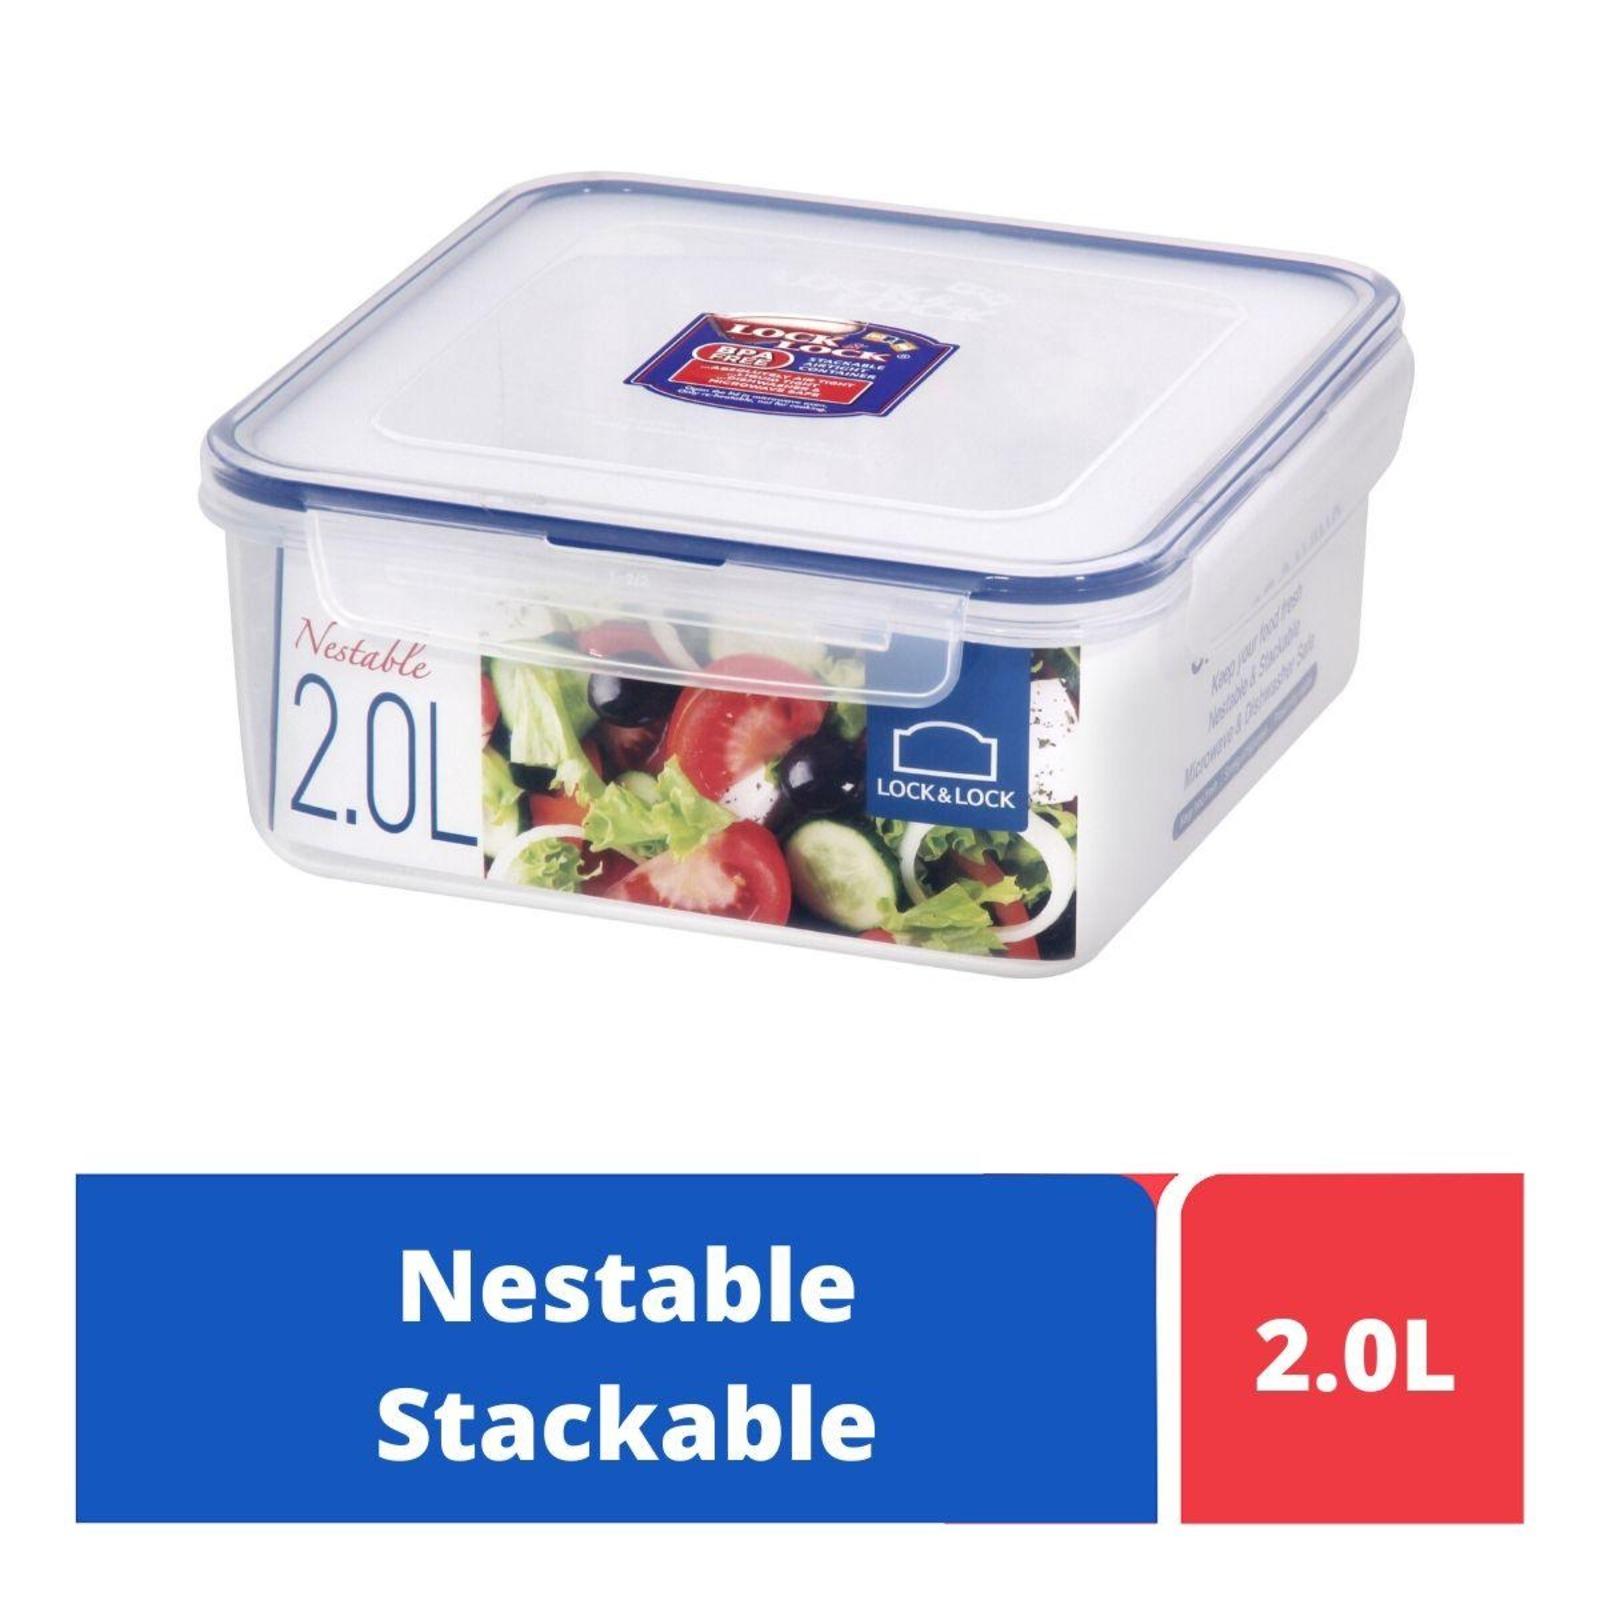 LOCK&LOCK Nestable Square Food Container 2.0L